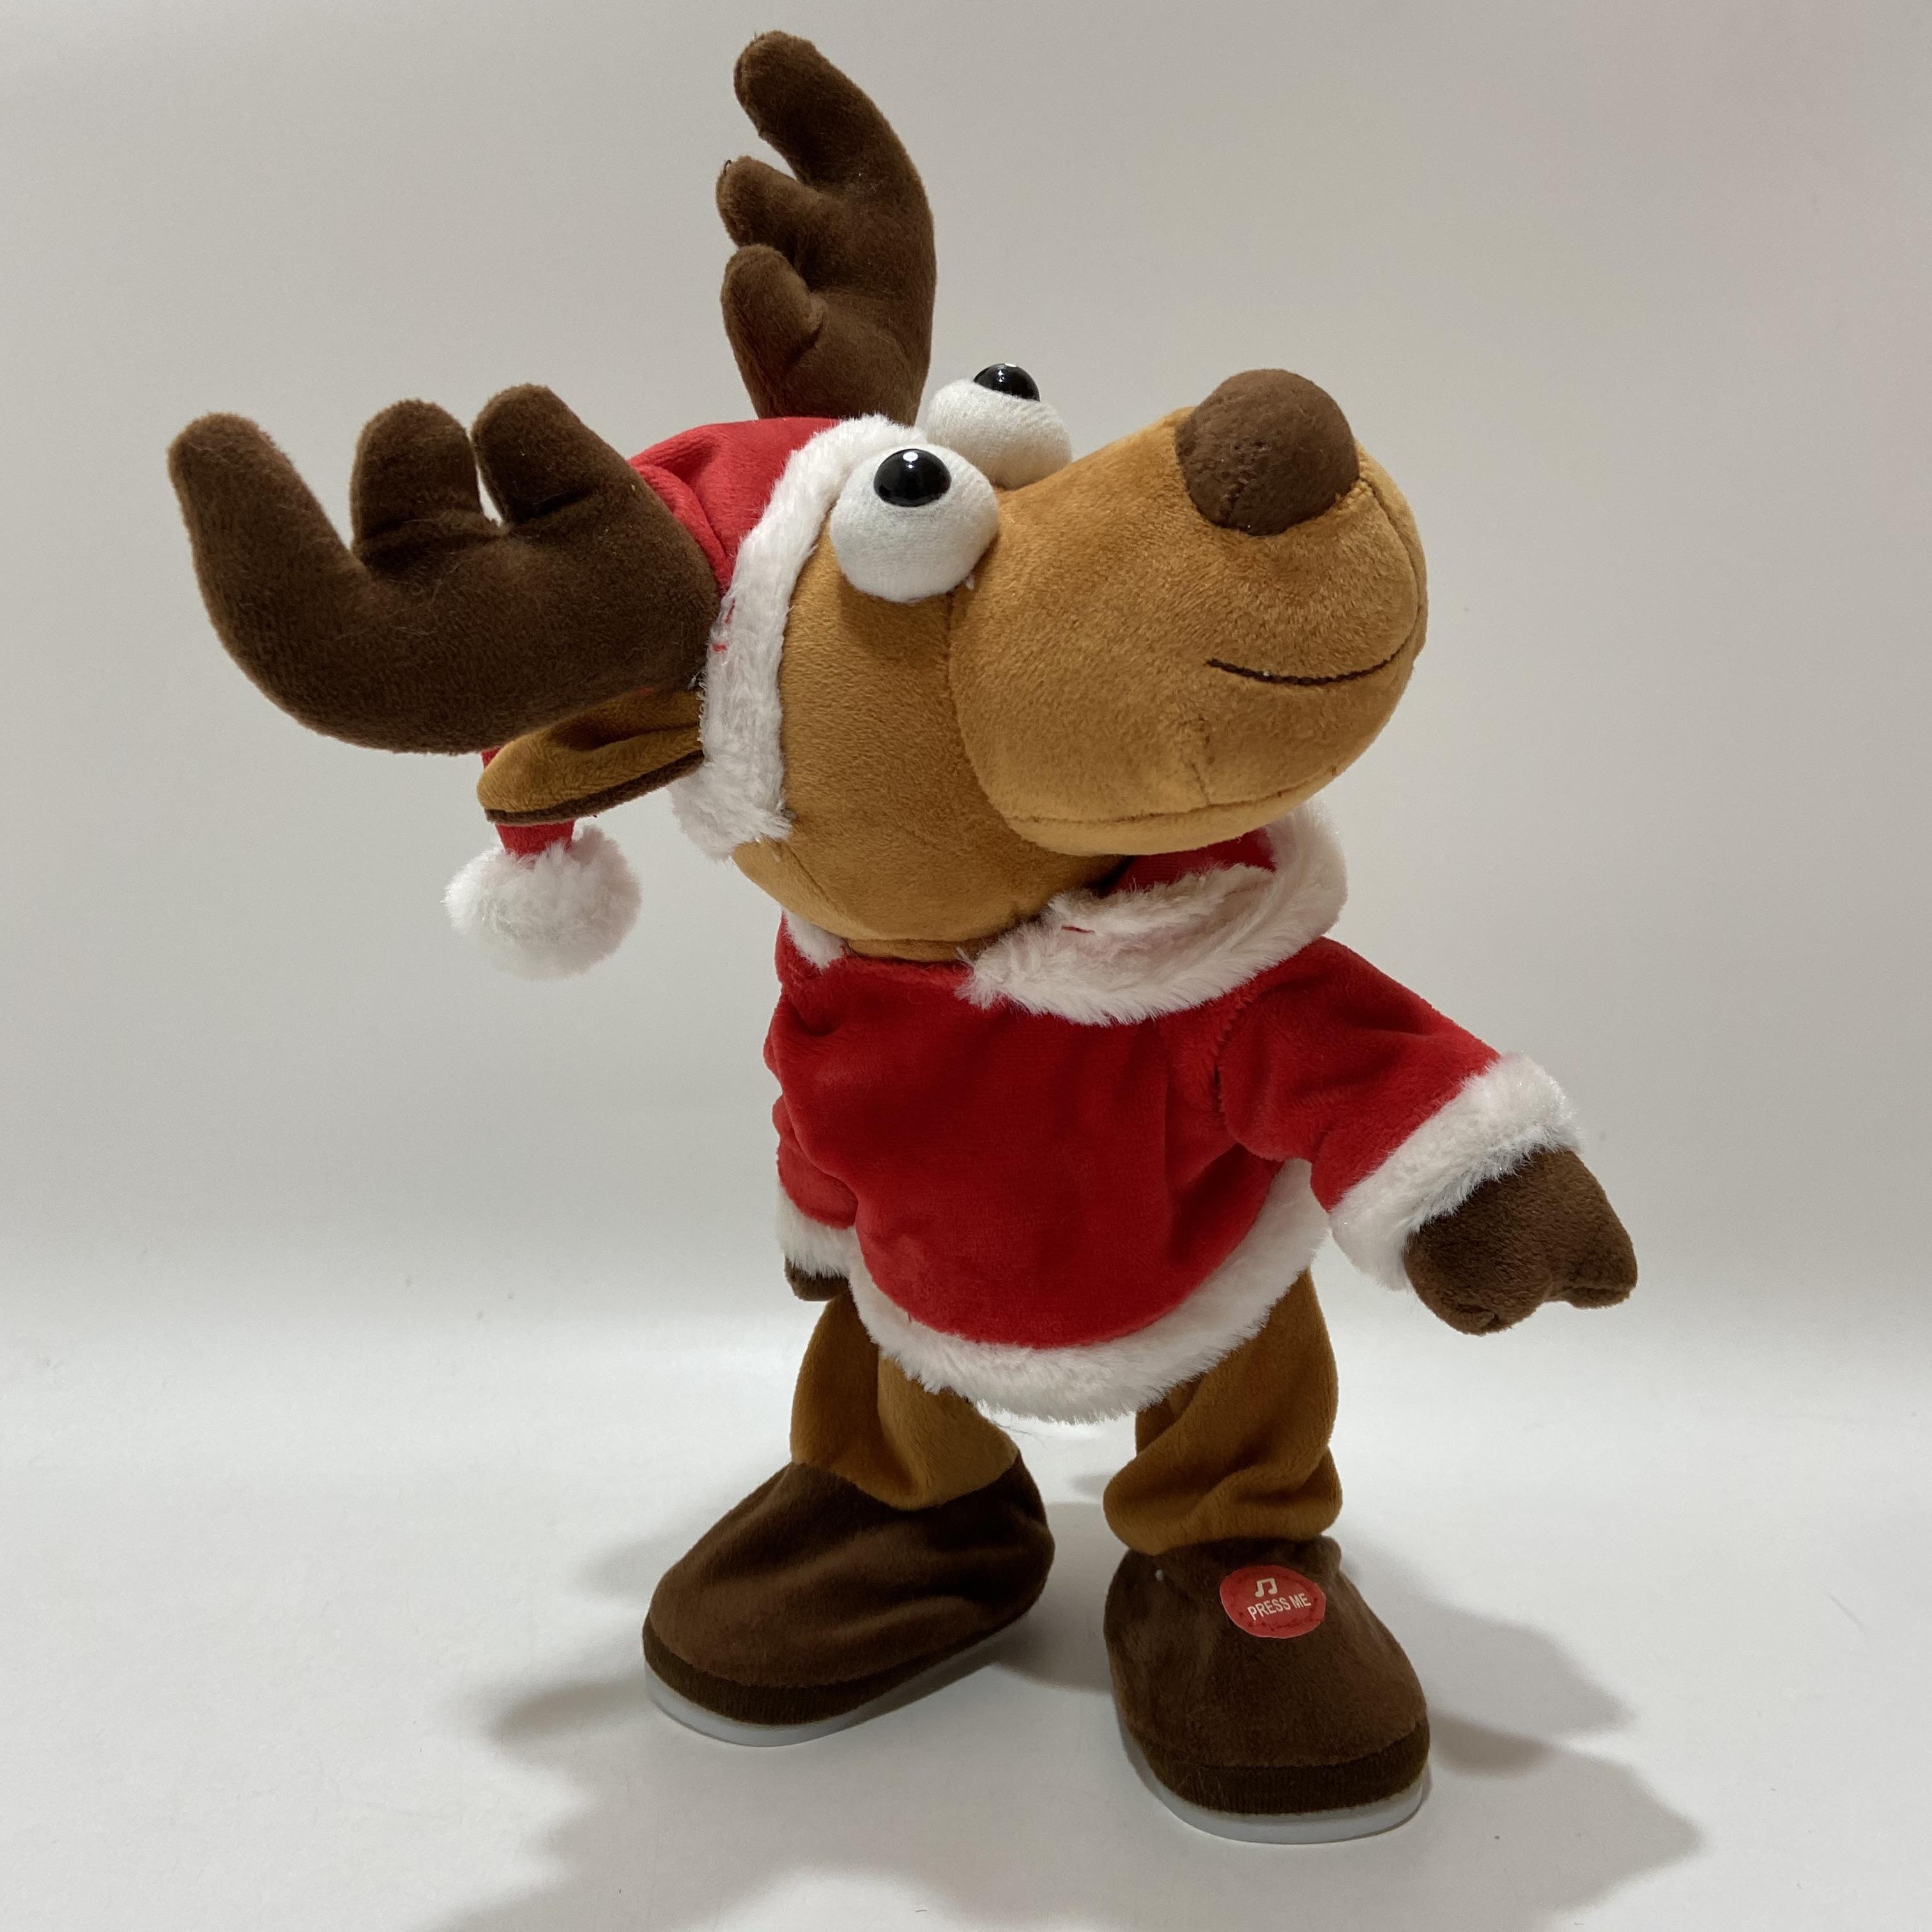 Shaking Buttom Reindeer